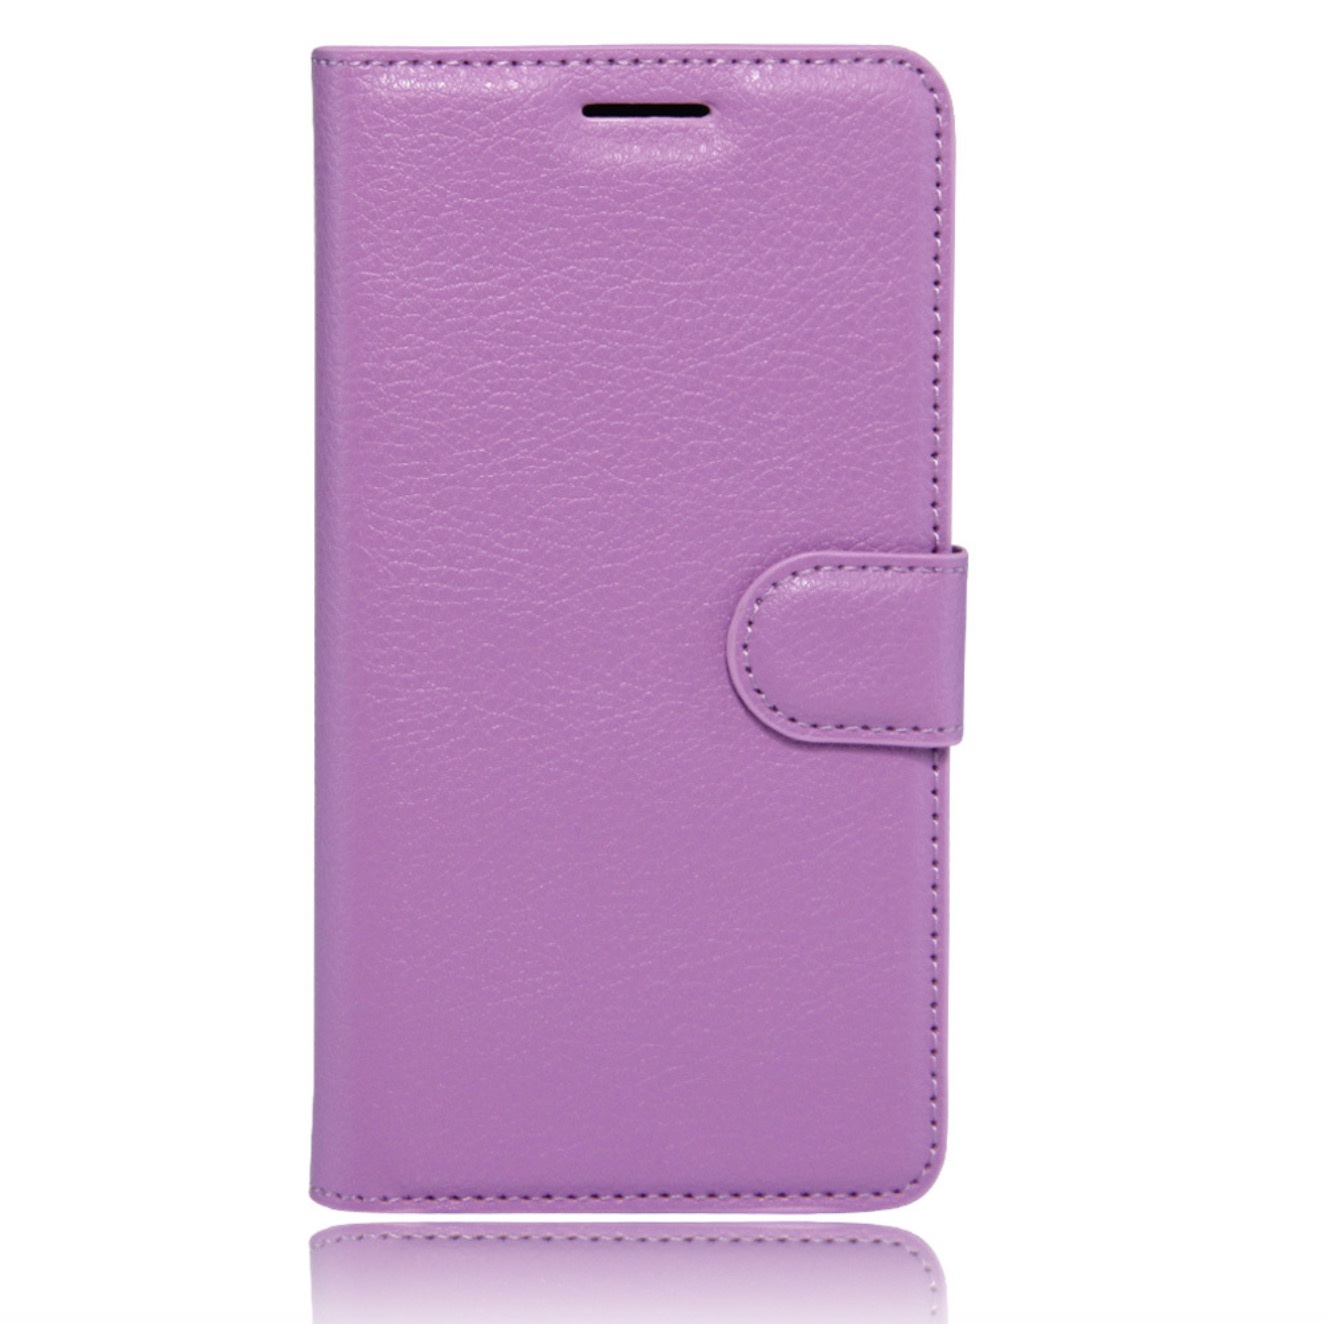 Чехол-книжка MyPads для LG Bello 2/ Prime 2 X155 с мульти-подставкой застёжкой и визитницей фиолетовый lg max x155